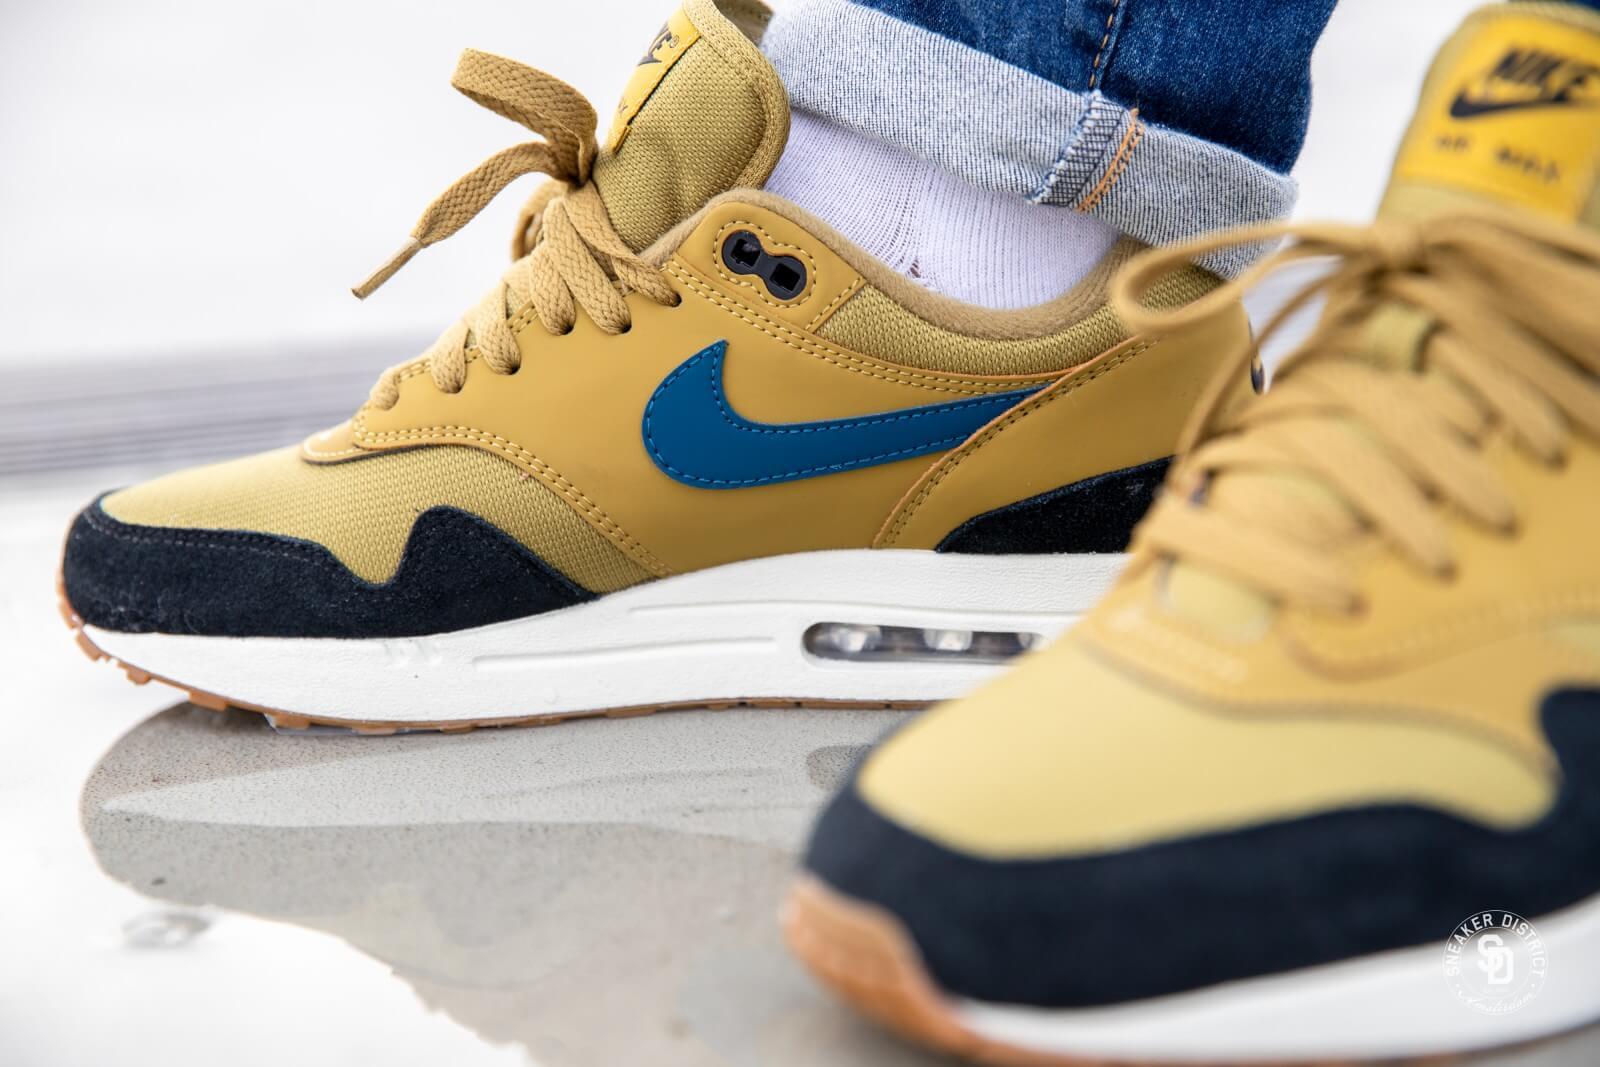 Nike Air Max 1 Golden Moss/Blue Force